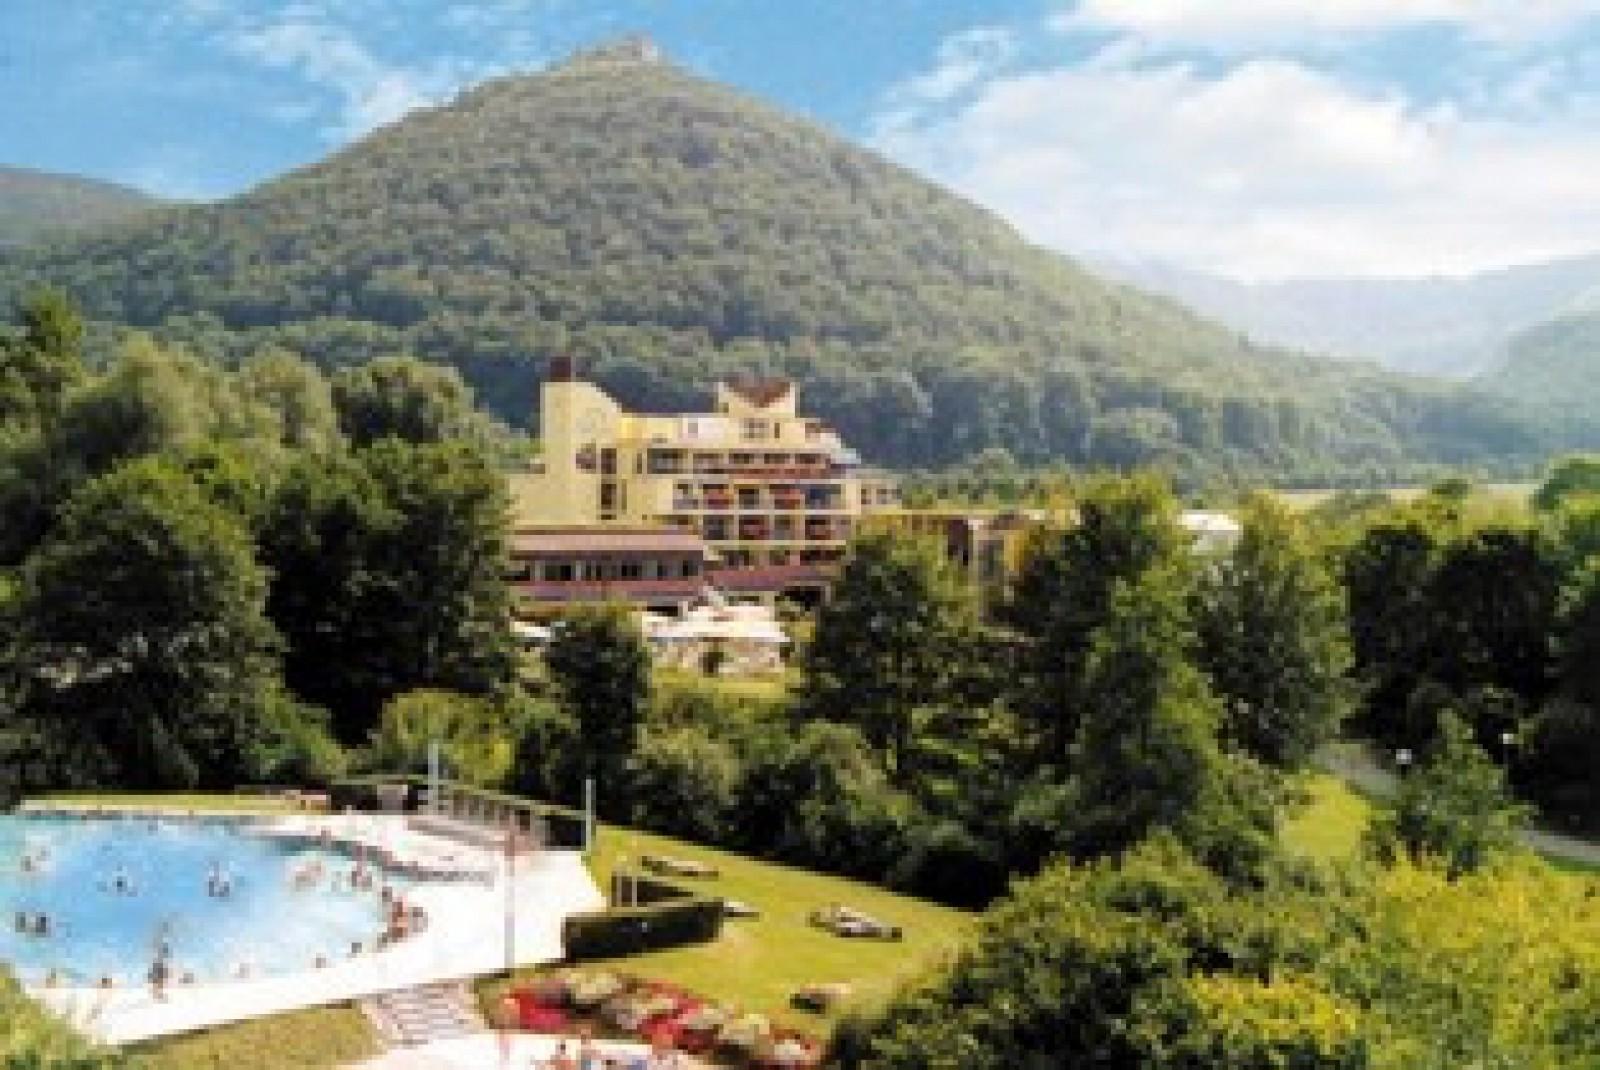 Speisekarte Hotel Graf Eberhard Bad Urach